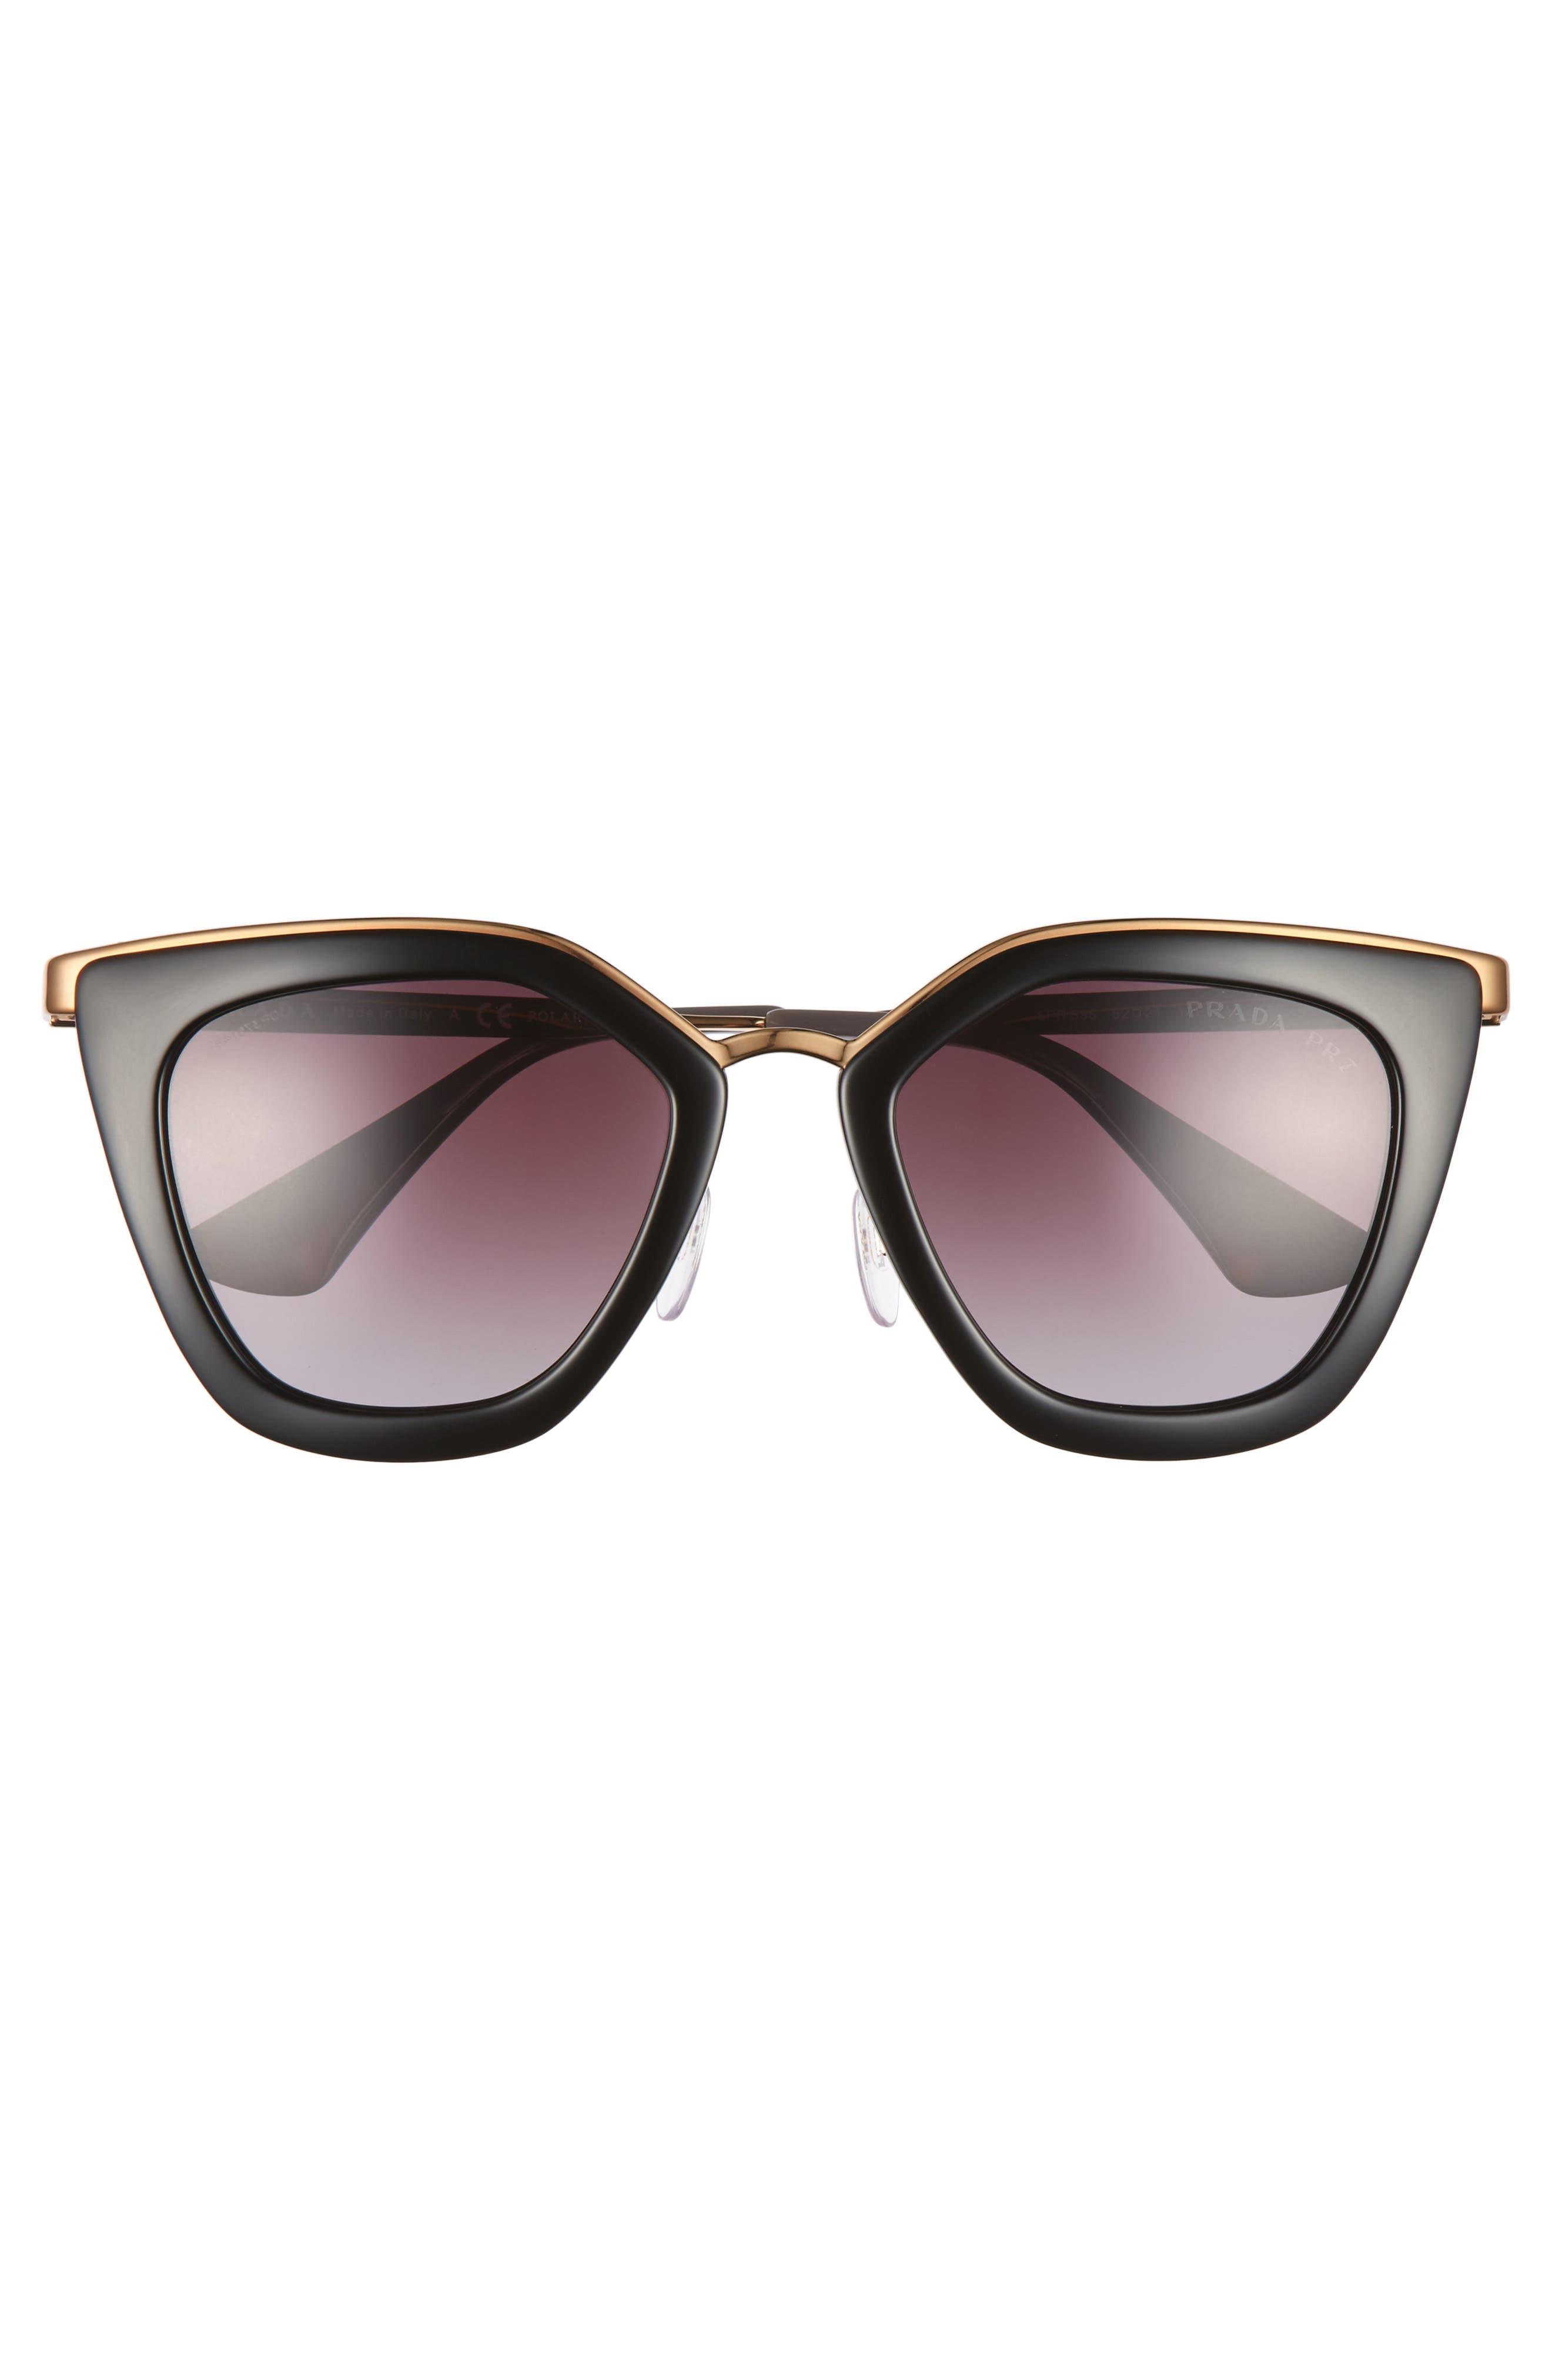 52mm Polarized Cat Eye Sunglasses,                             Alternate thumbnail 3, color,                             001